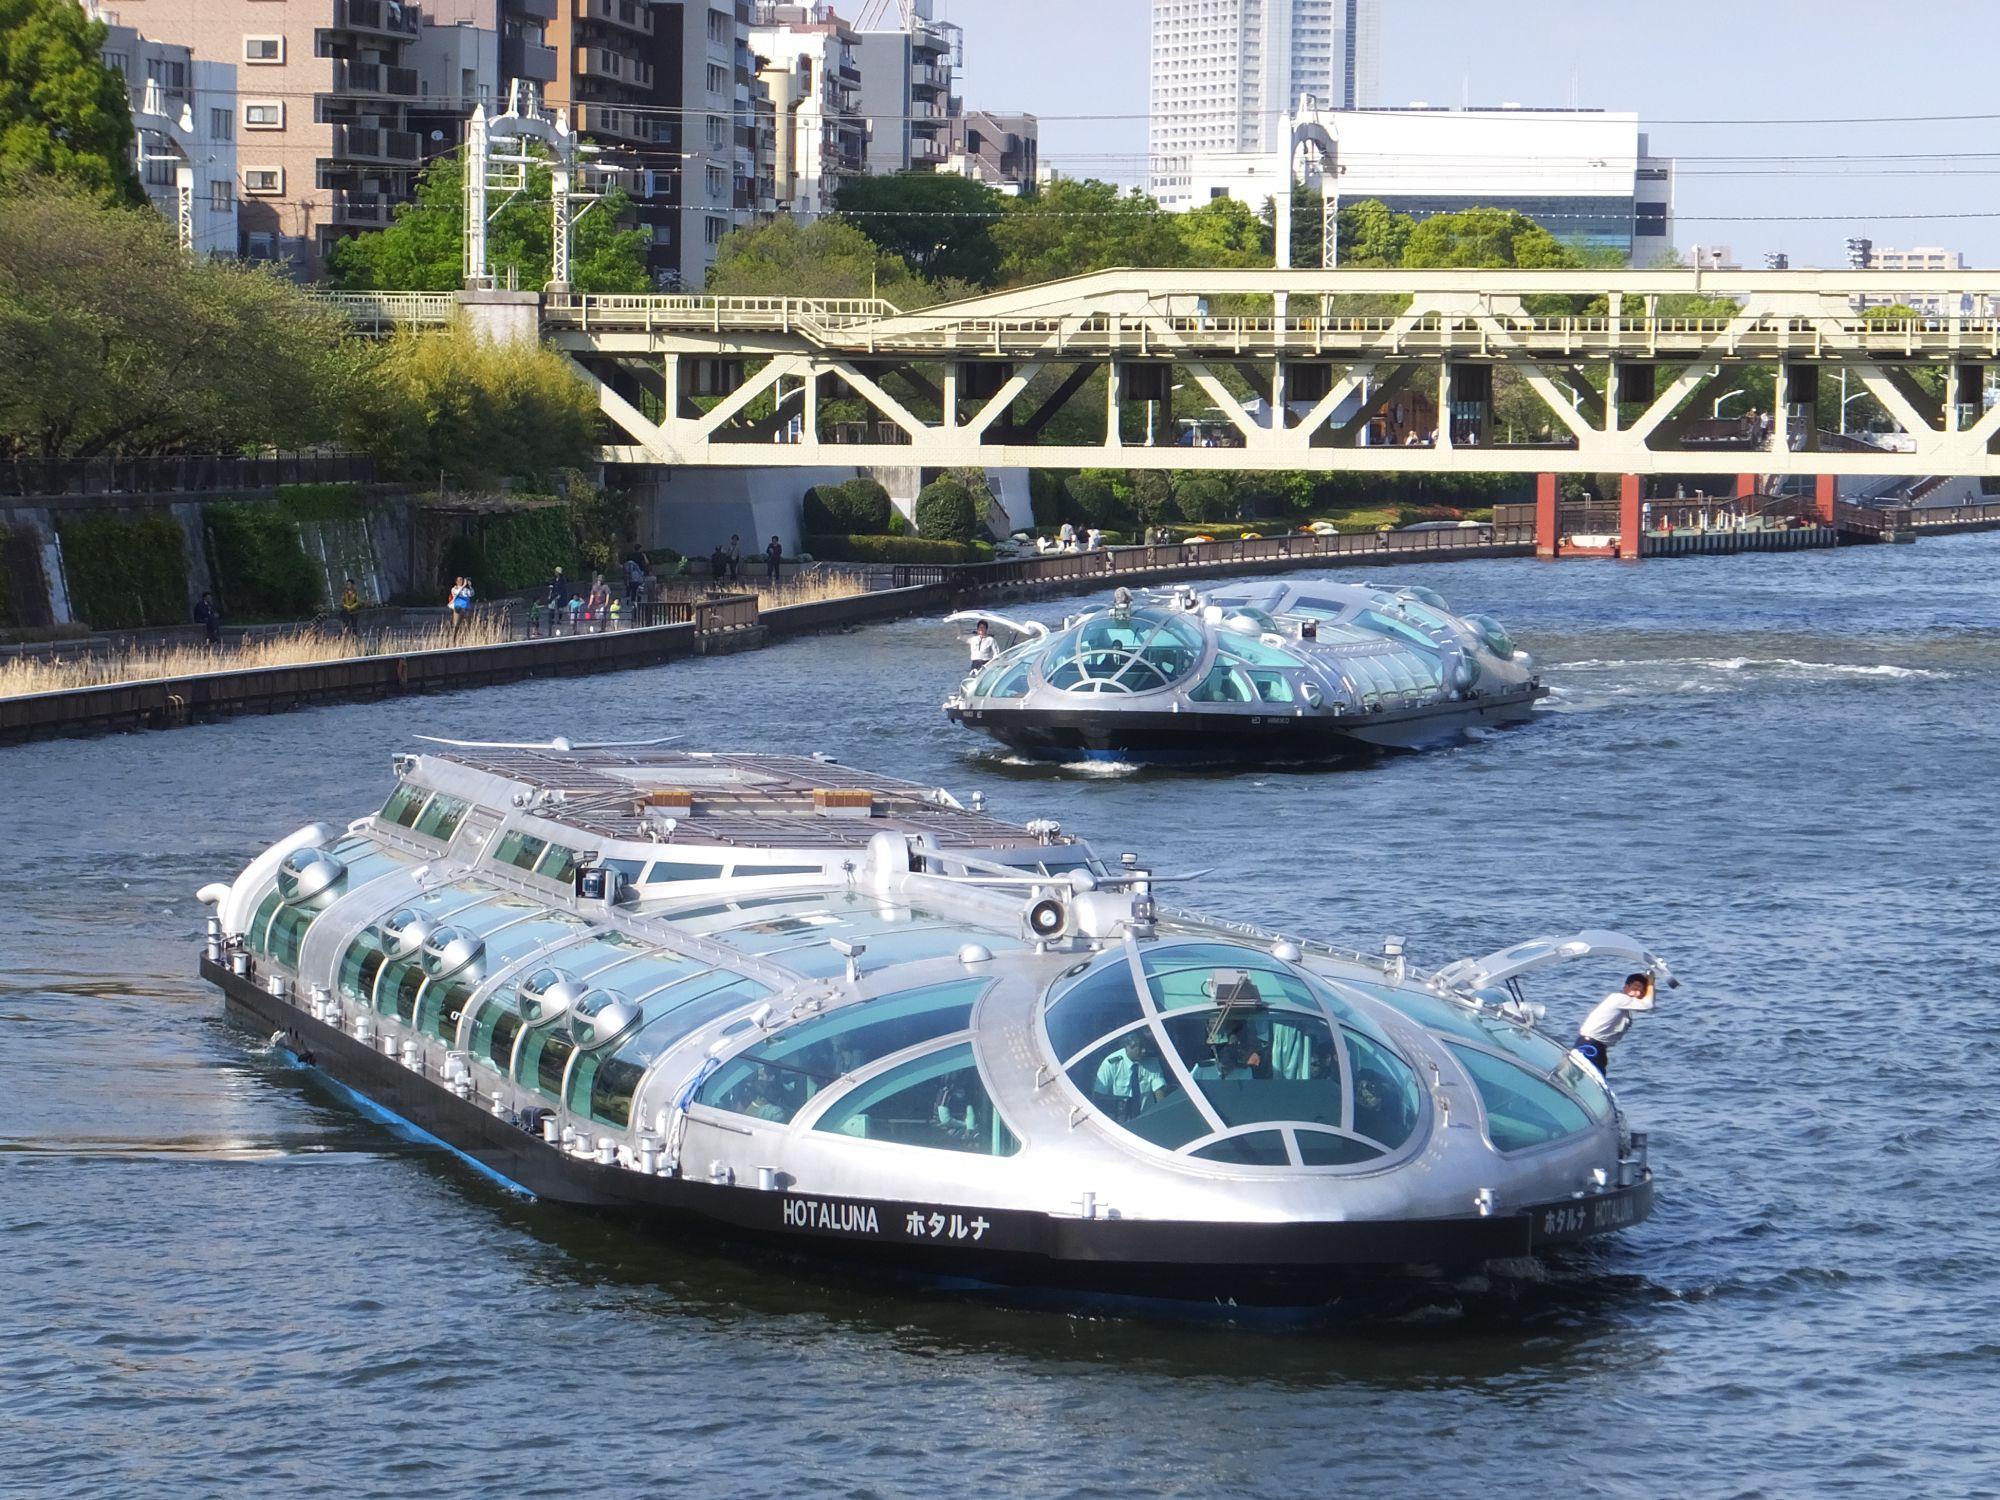 [Image: Water_buses_Hotaluna_and_Himiko_201604.jpg]